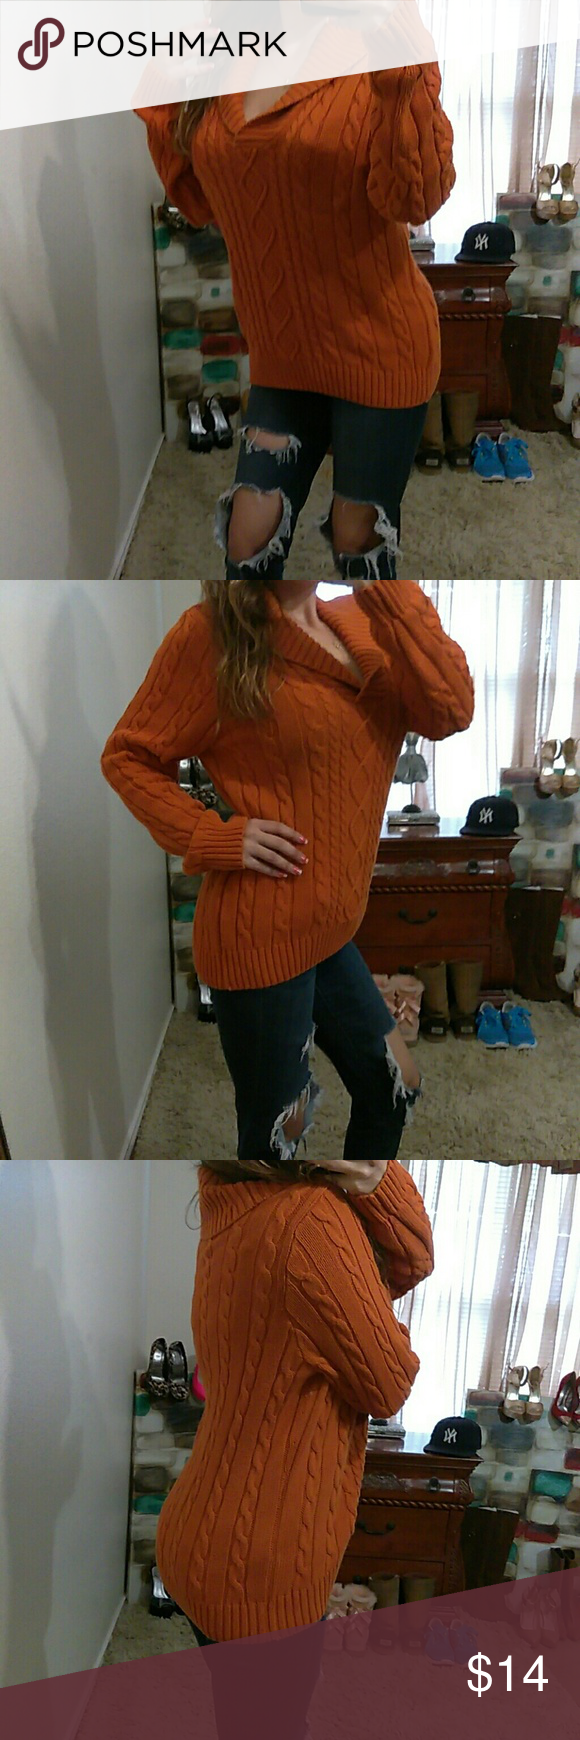 "Orange Cable Knit L VNeck Sweater Excellent condition- 100% Cotton- bust: 24"" (relax) length: 27"" (shoulder to bottom hem)** model is 5""2, 115 lbs & 34D** Jeanne Pierre Sweaters V-Necks"